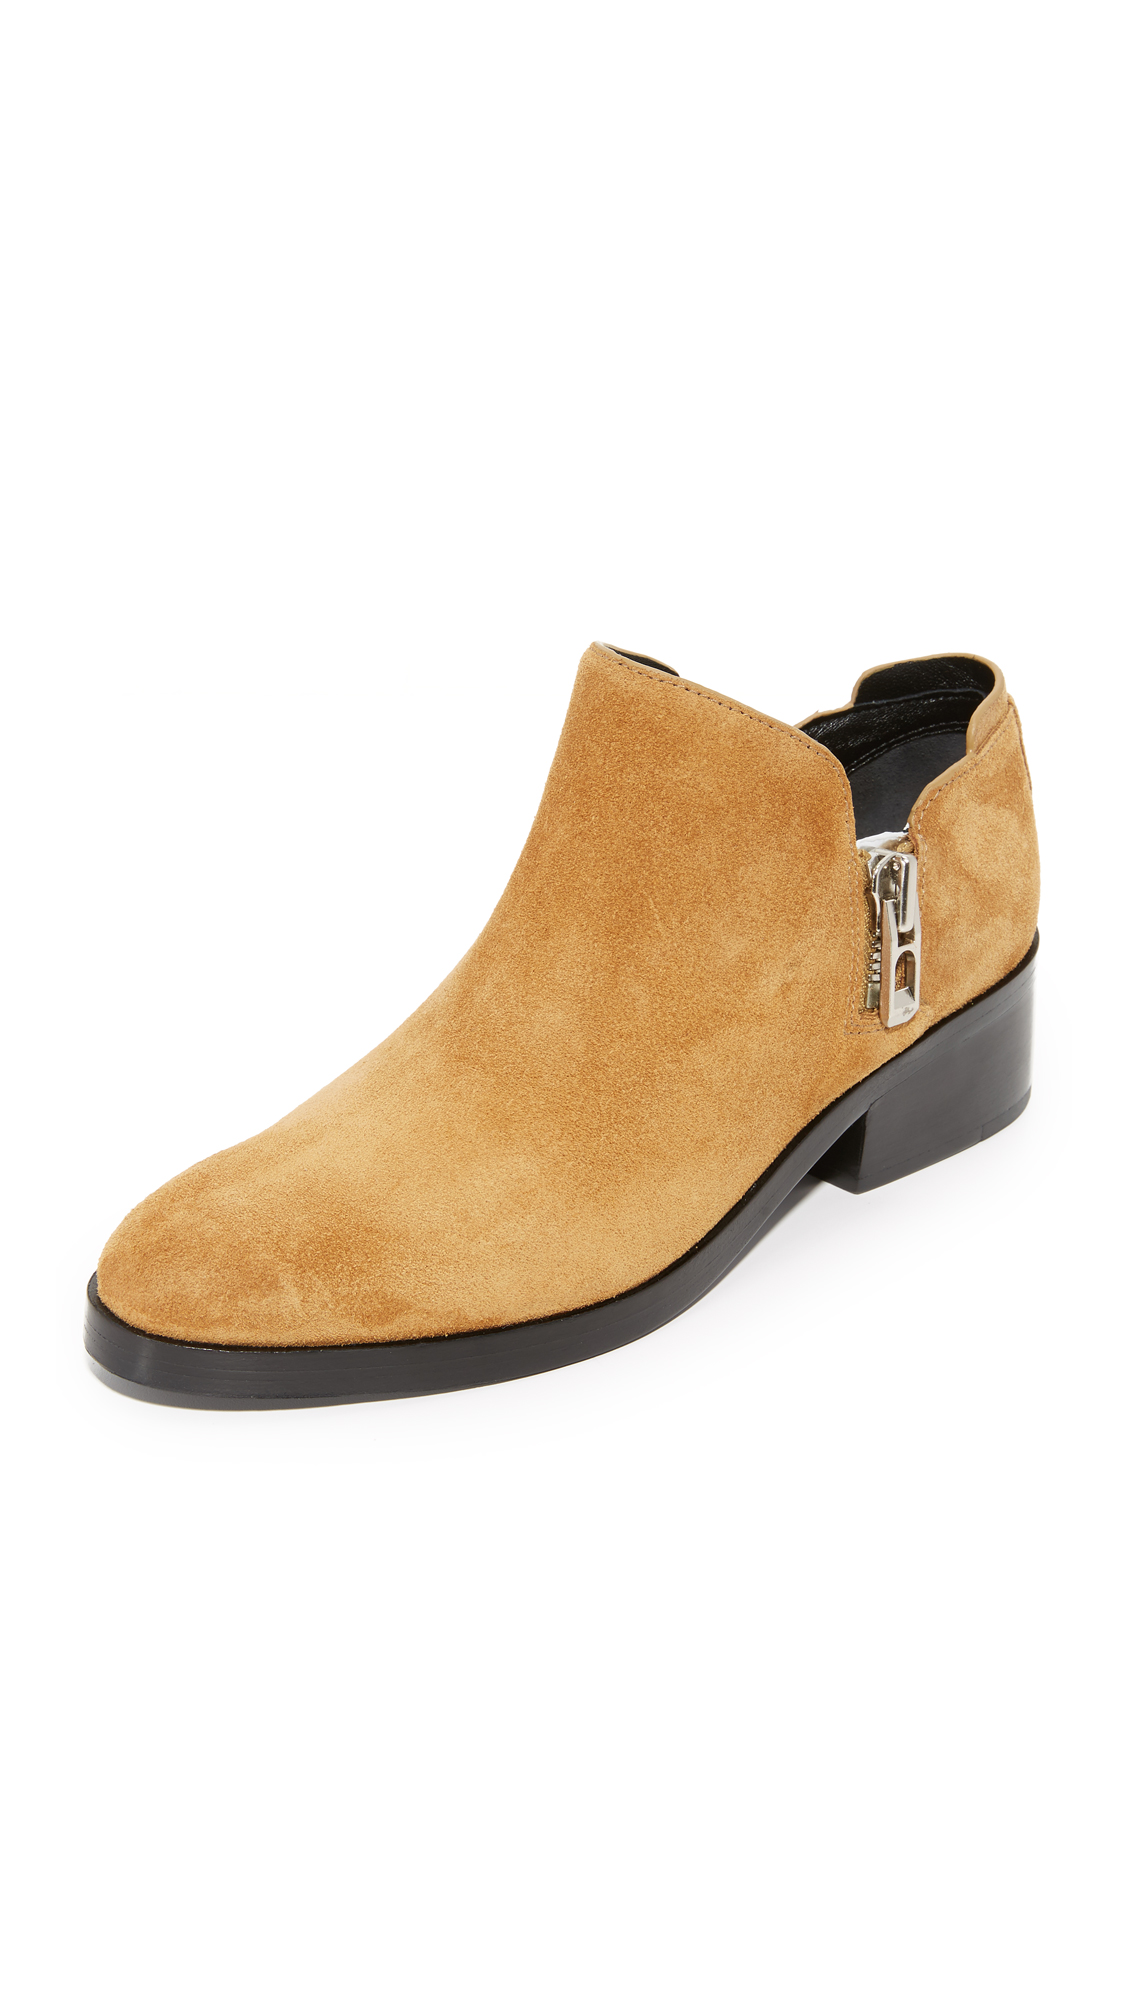 3.1 Phillip Lim Alexa Ankle Booties - Oak at Shopbop